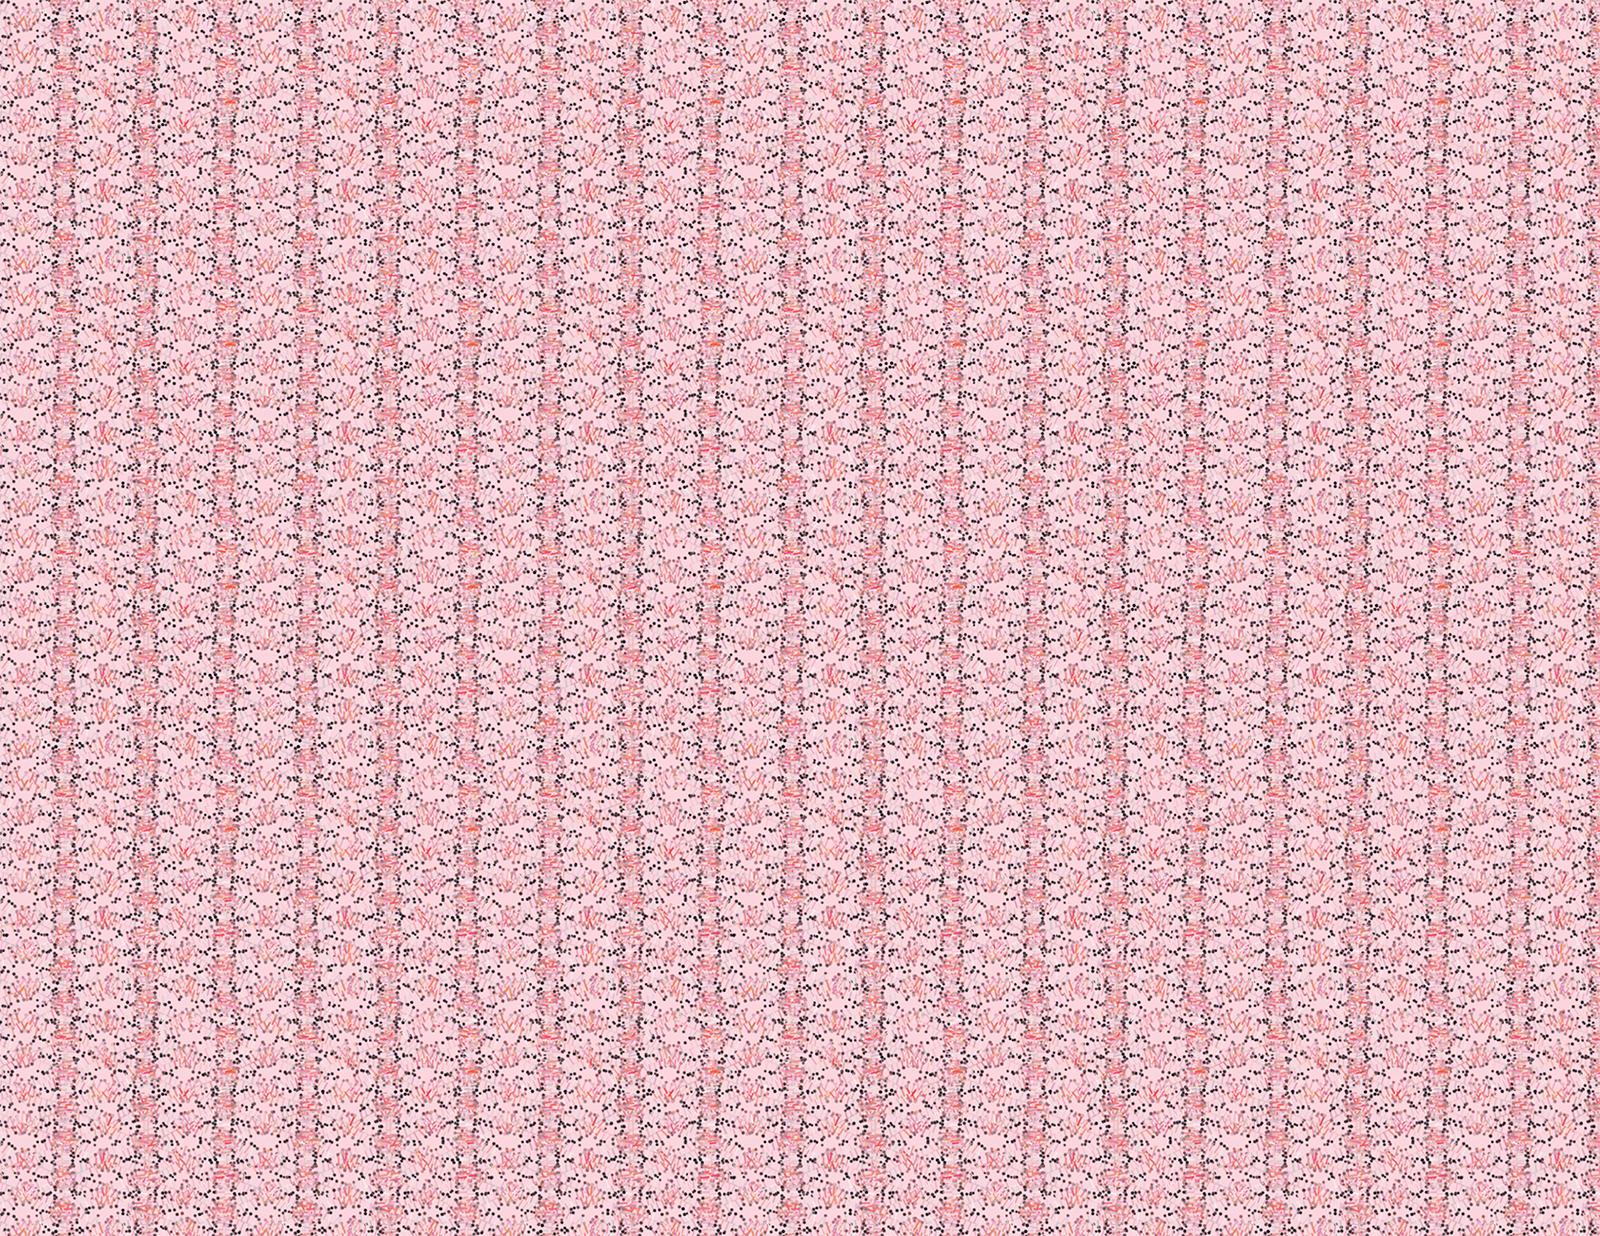 Free Scrapbook Paper To Print | Lovetoknow - Free Printable Pattern Paper Sheets